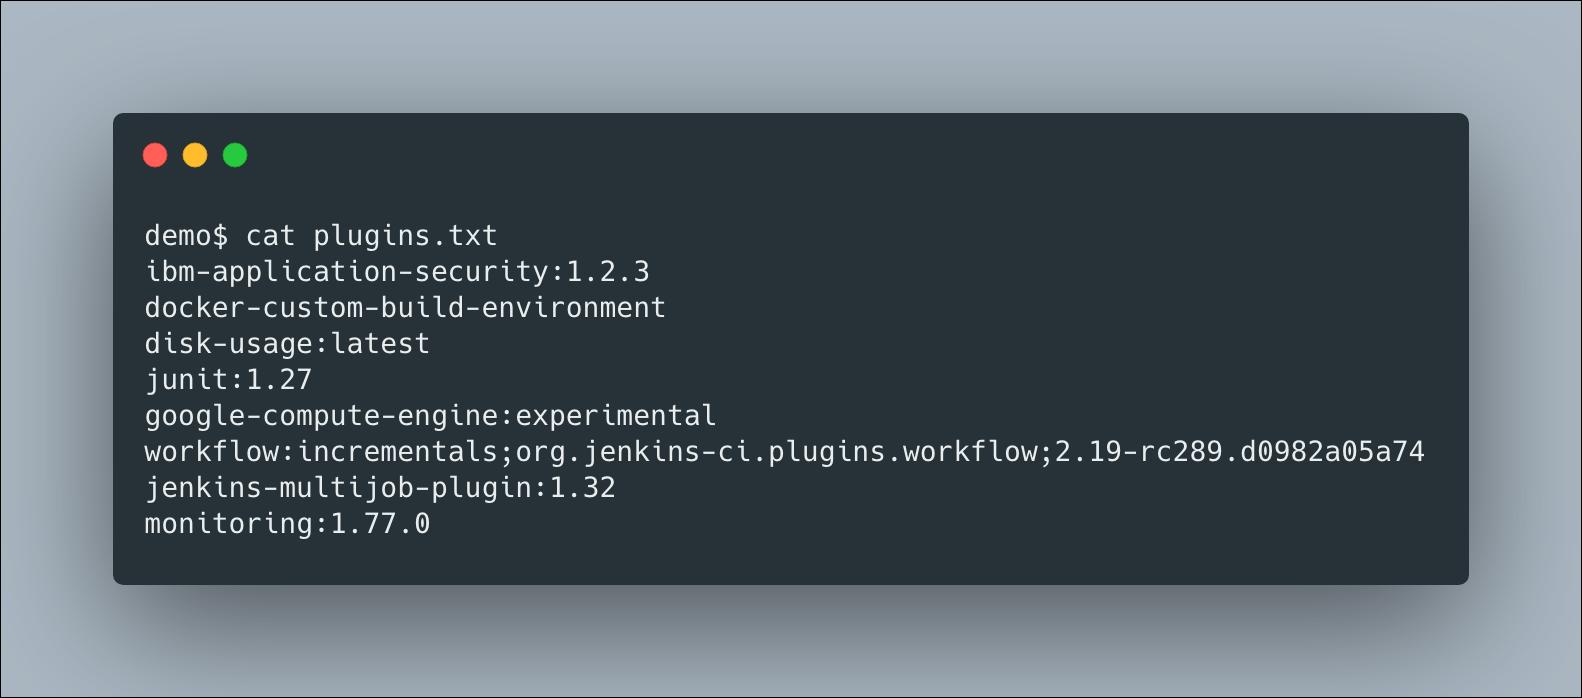 Example plugins.txt File